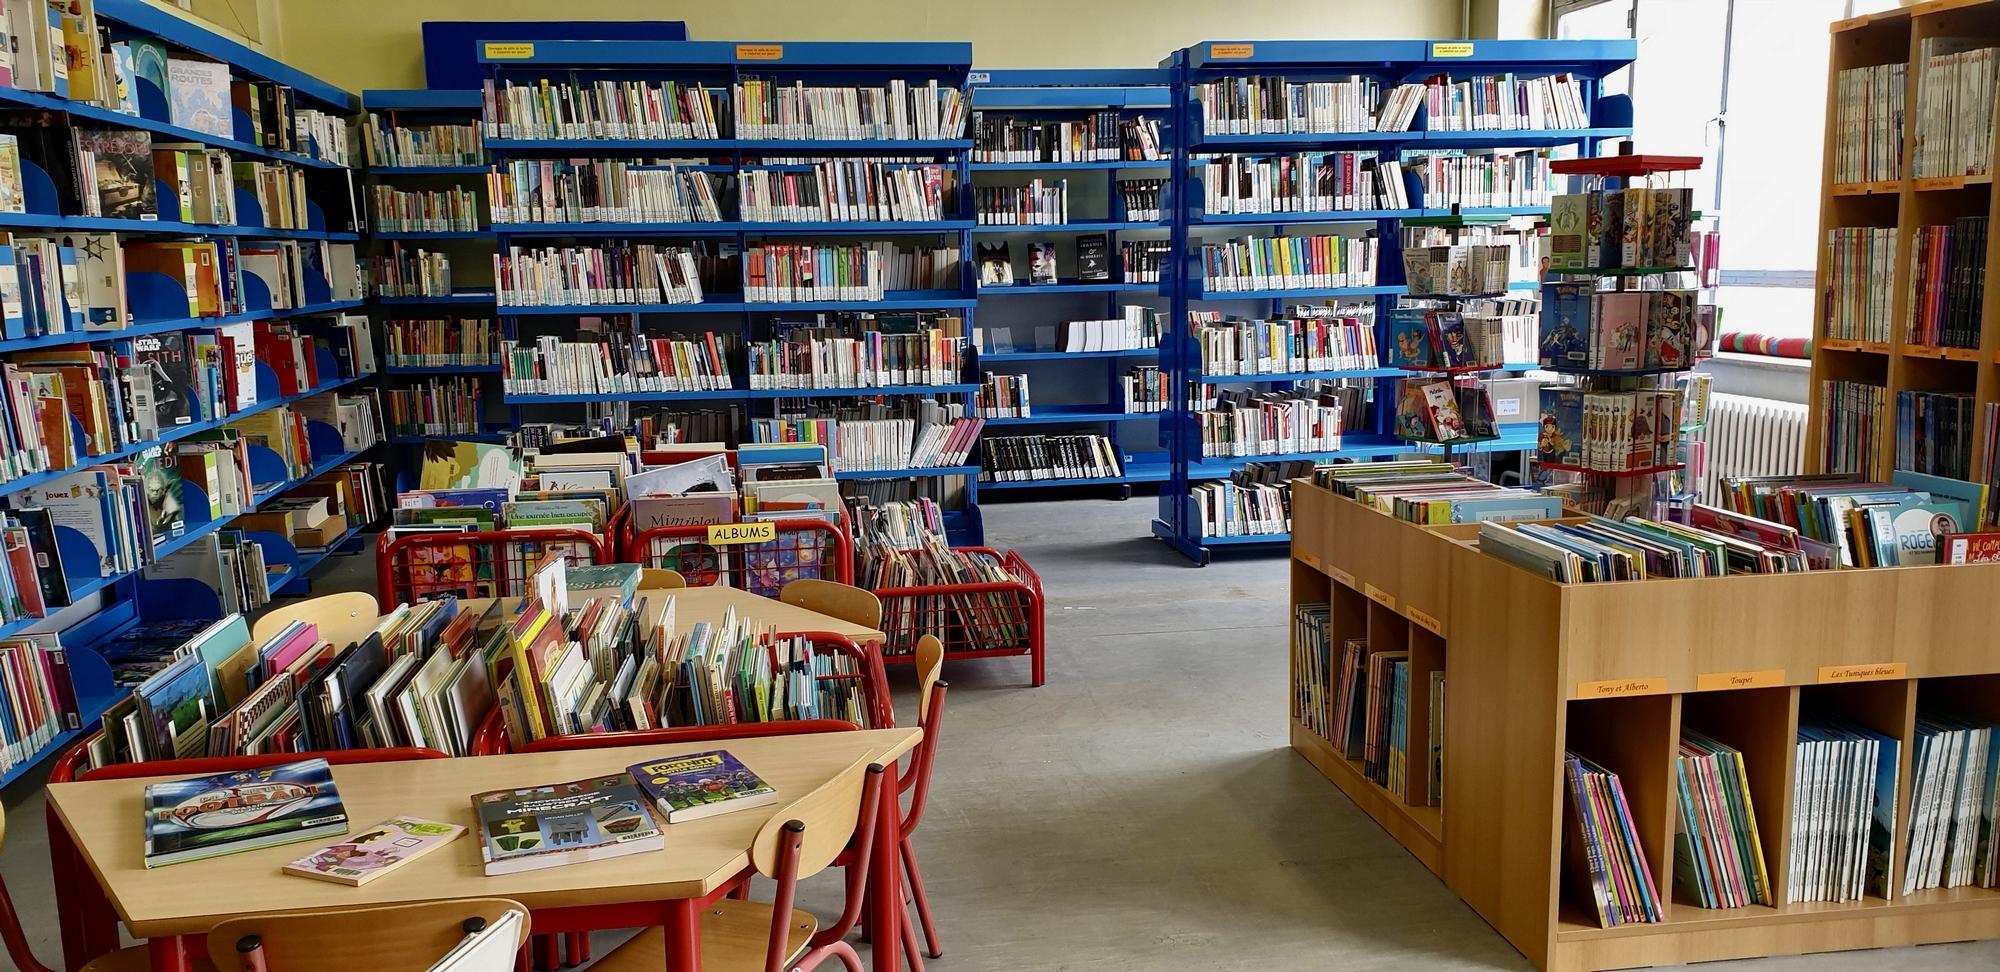 Rayonnages de la bibliothèque de Jumet